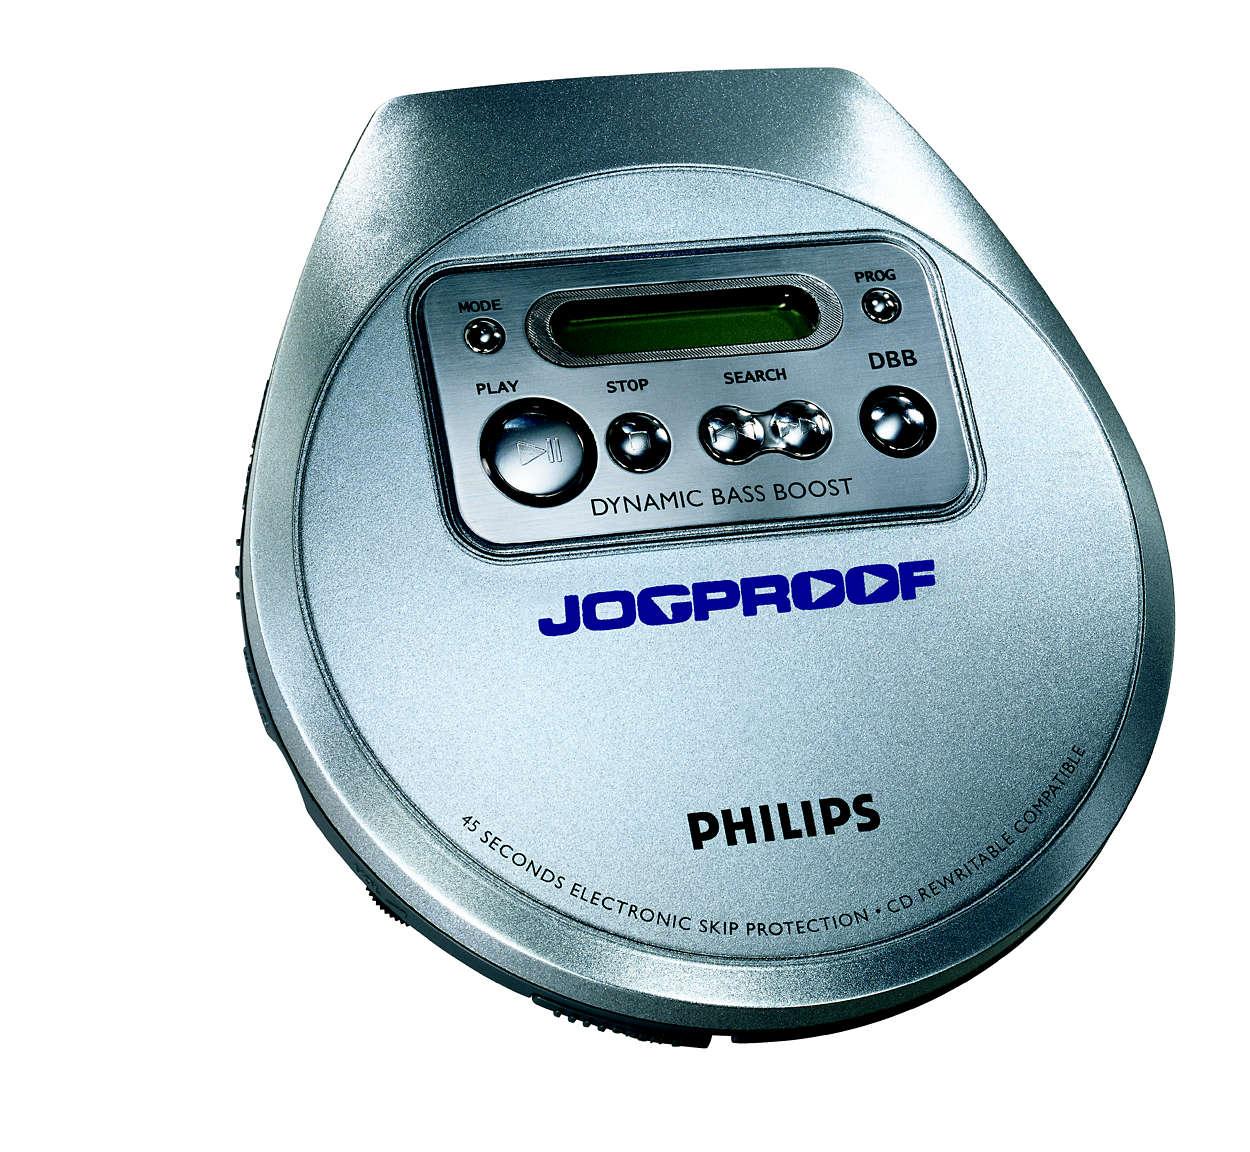 Portable cd player ax2301 05z philips - Mobile porta cd ...